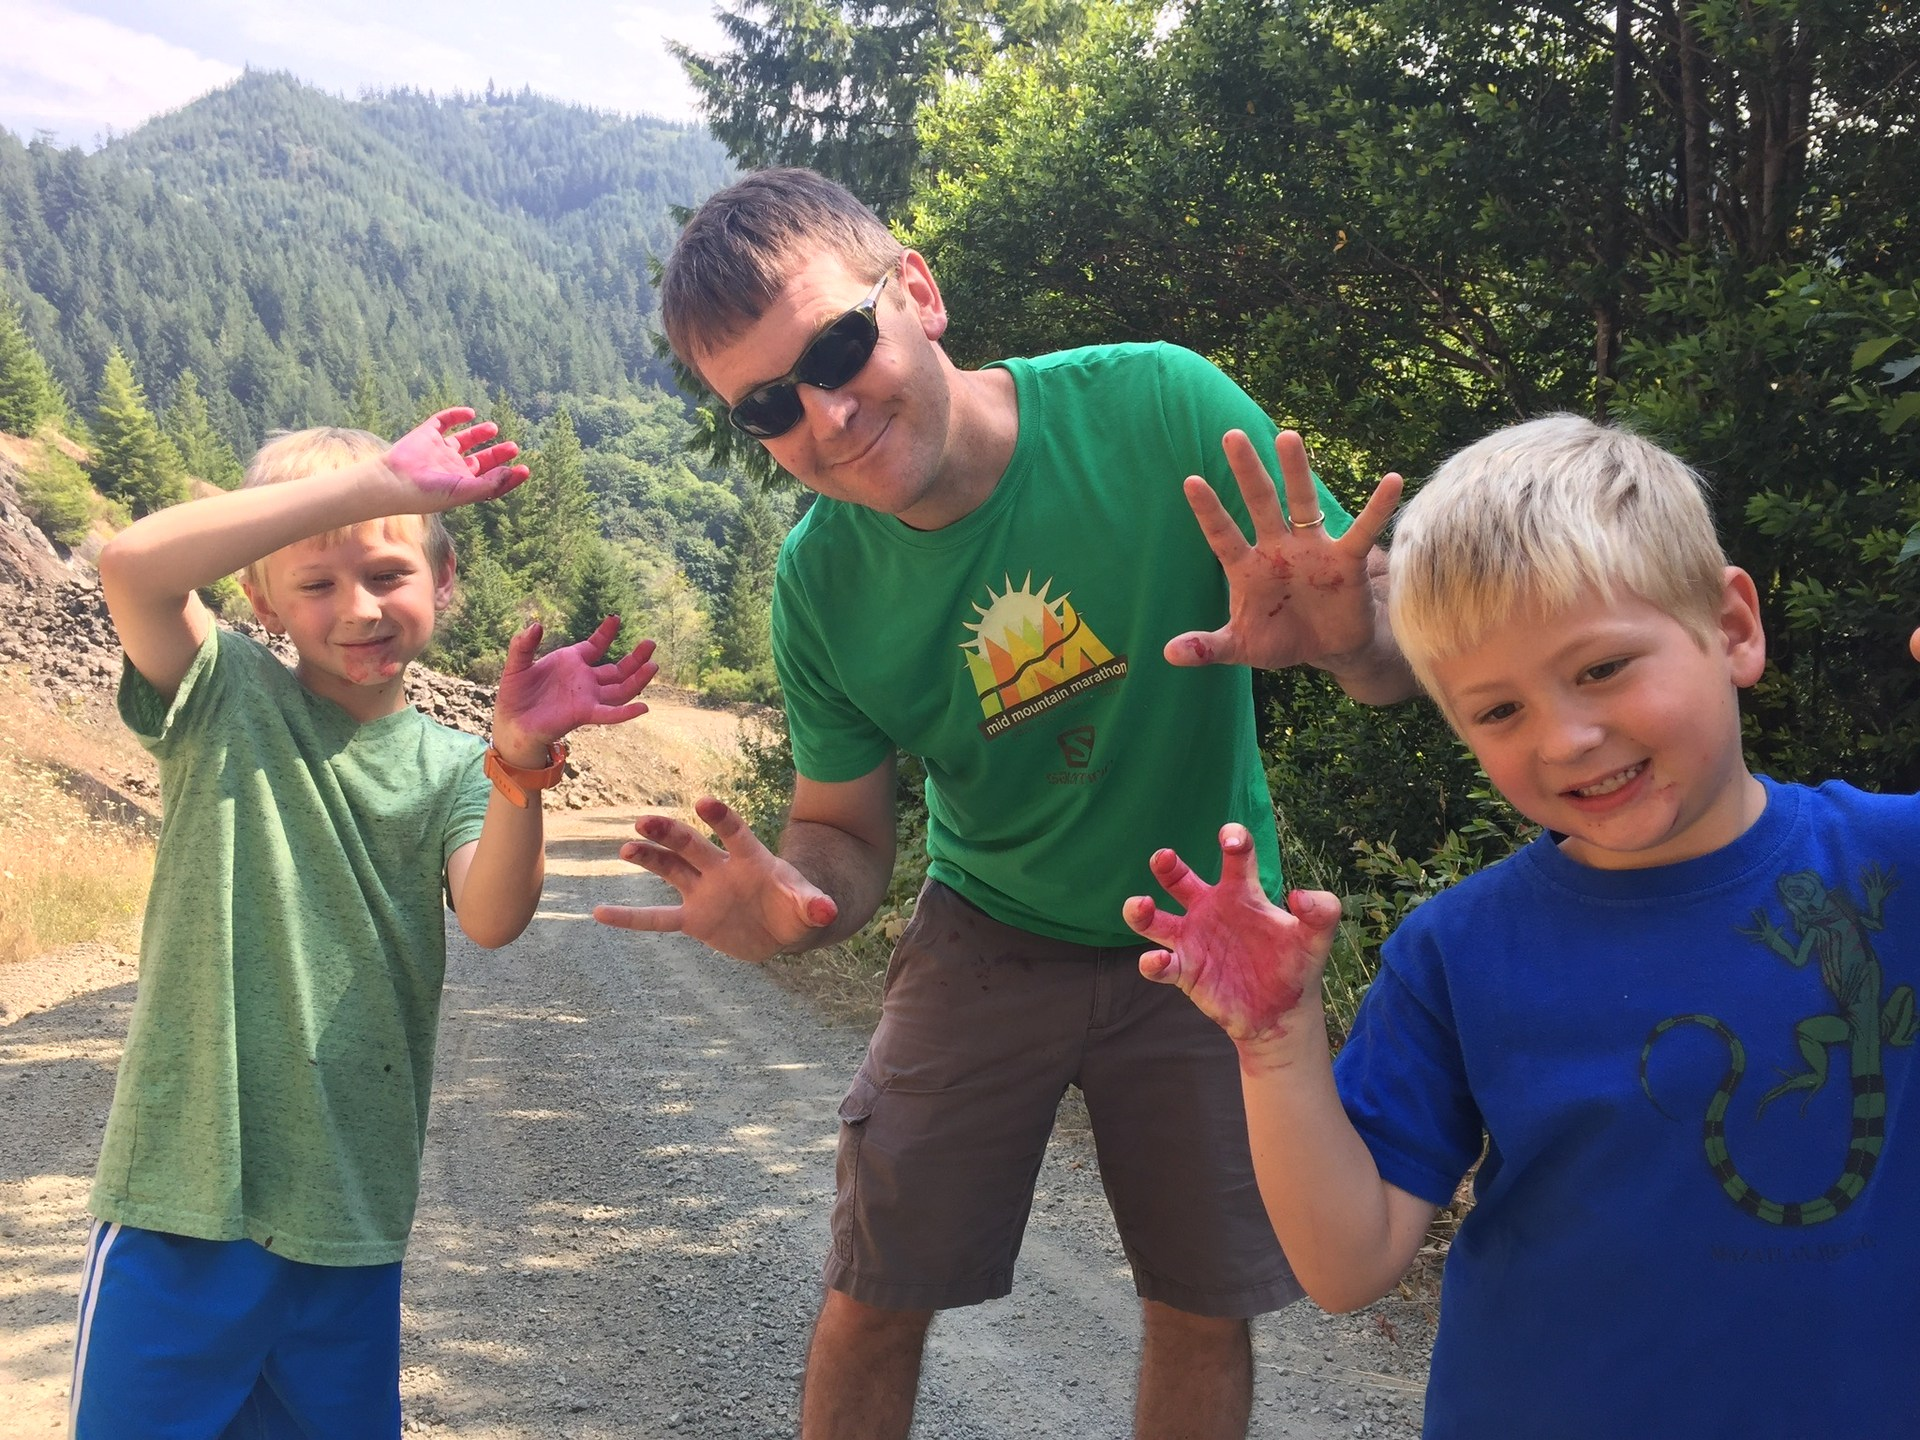 Blackberry picking in Oregon